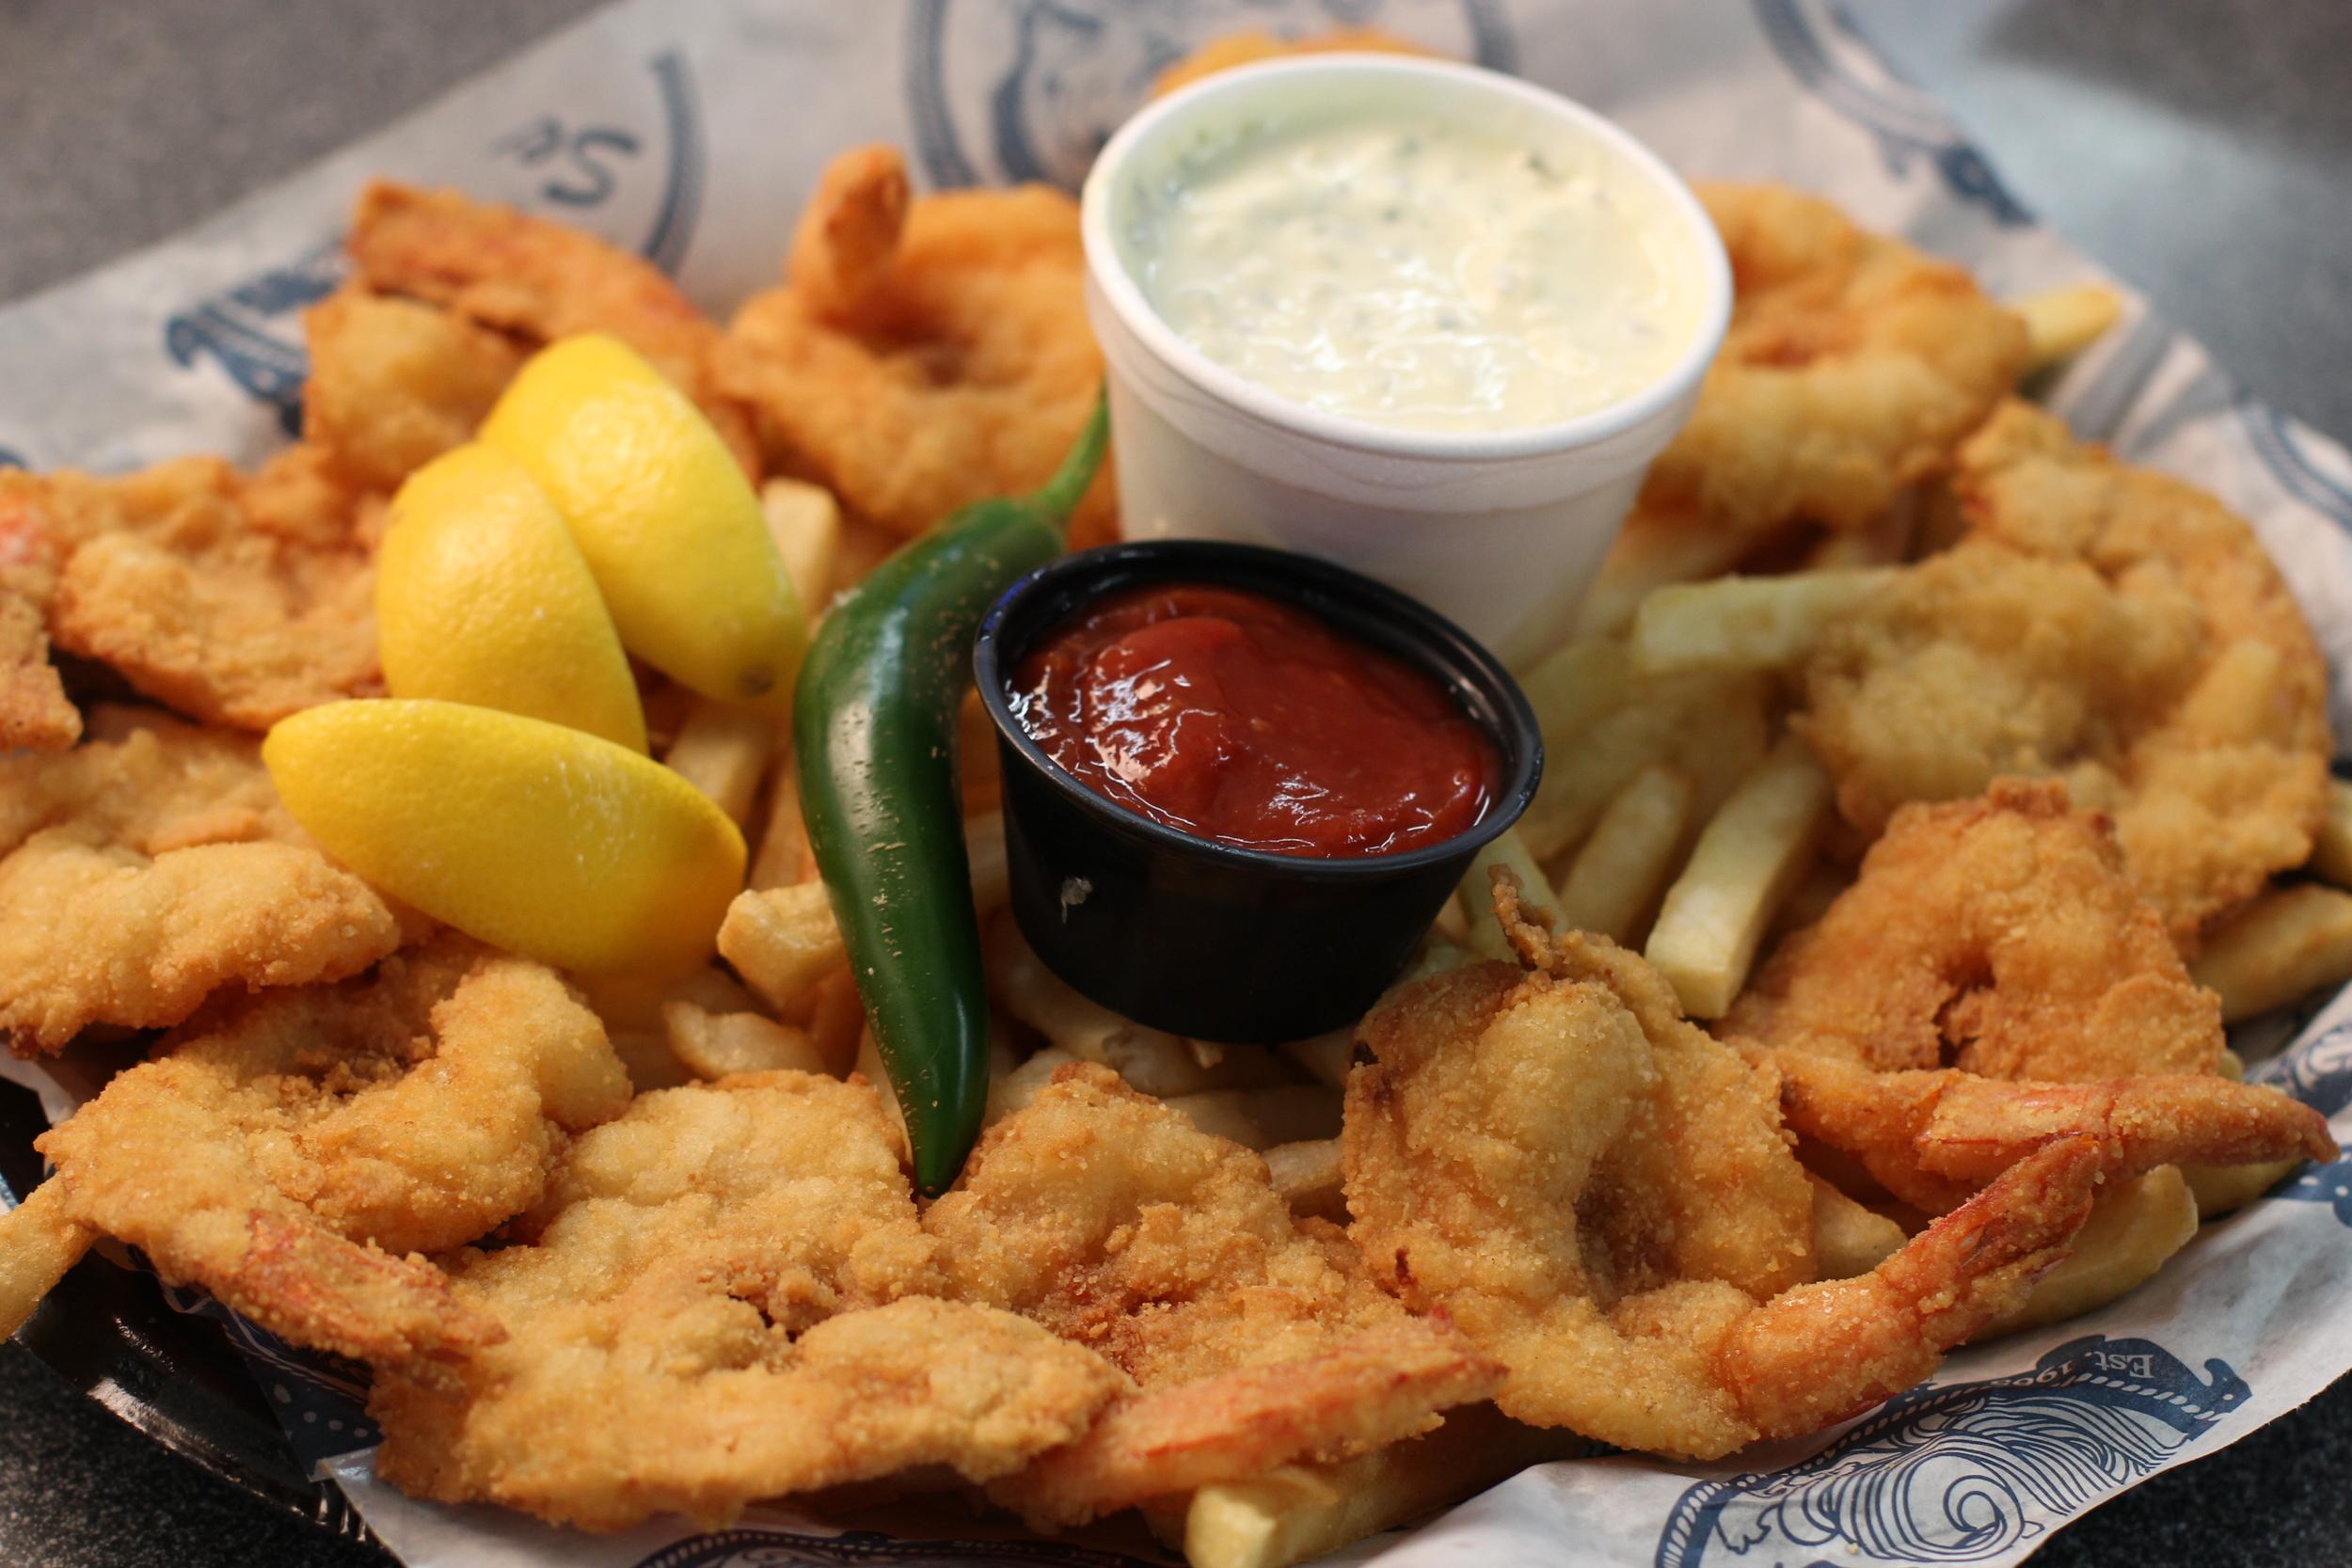 Rudys Seafood